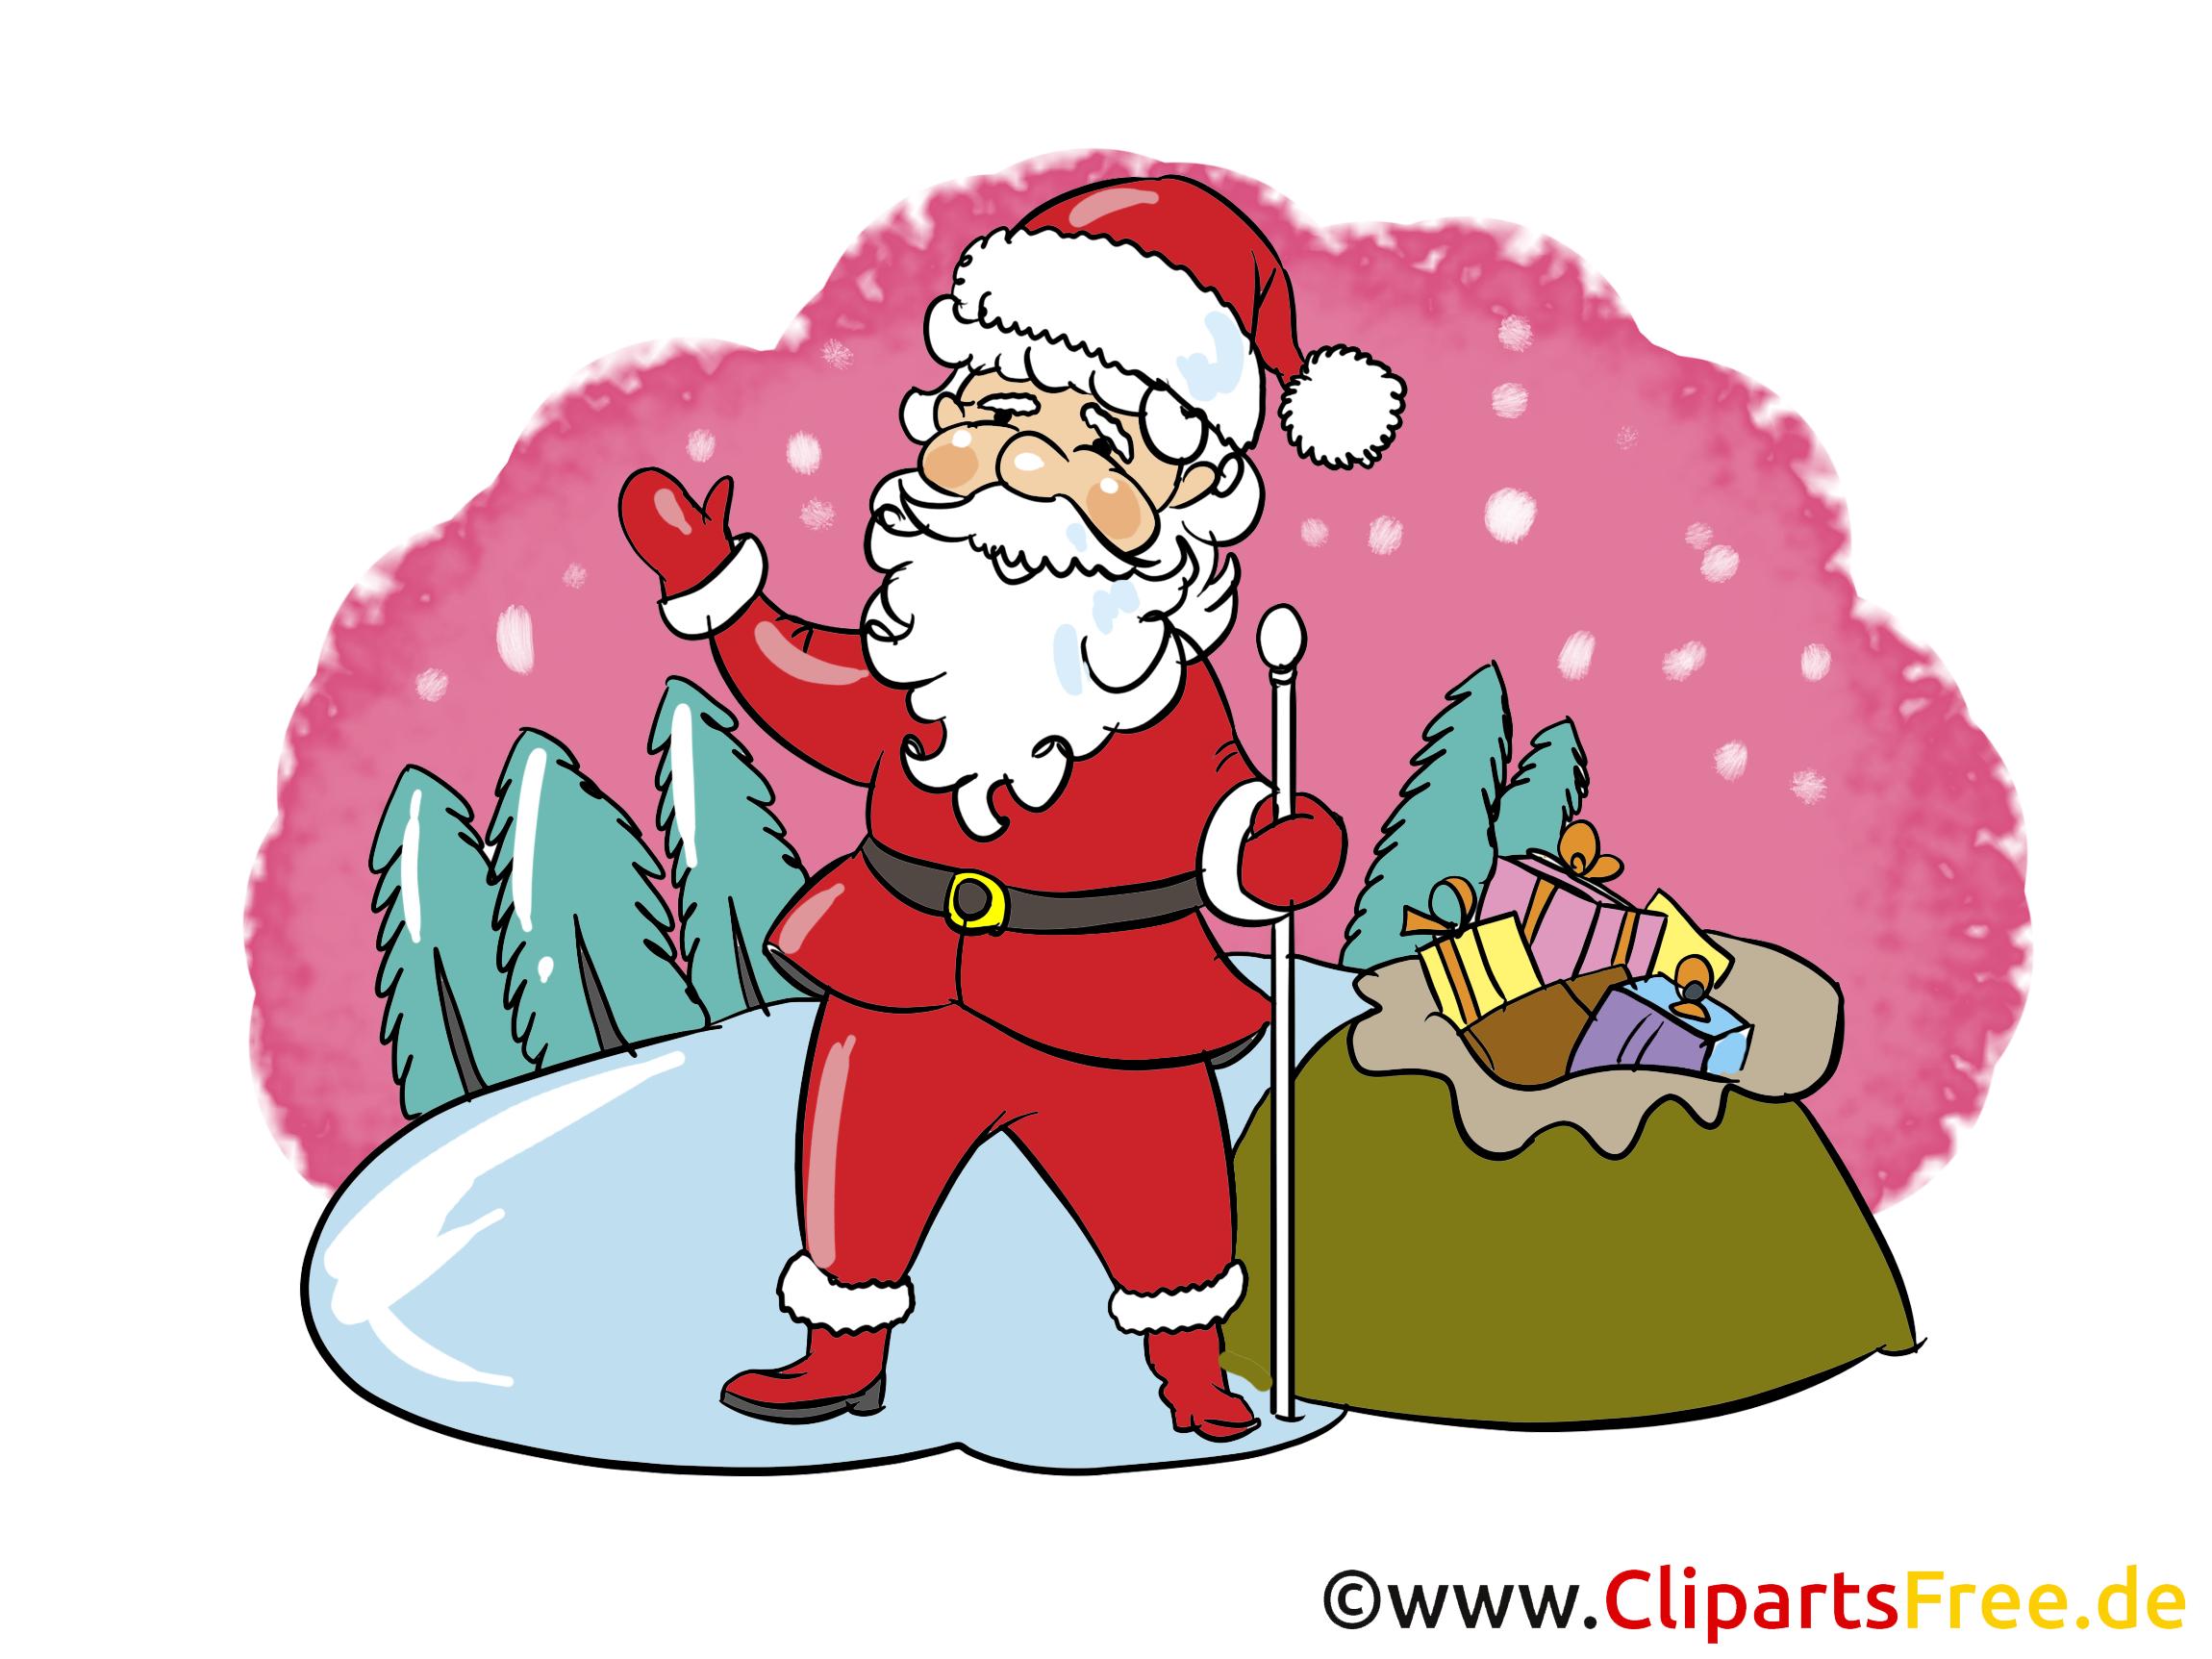 Geschenke zum Silvetser Clipart, Bild, Cartoon gratis